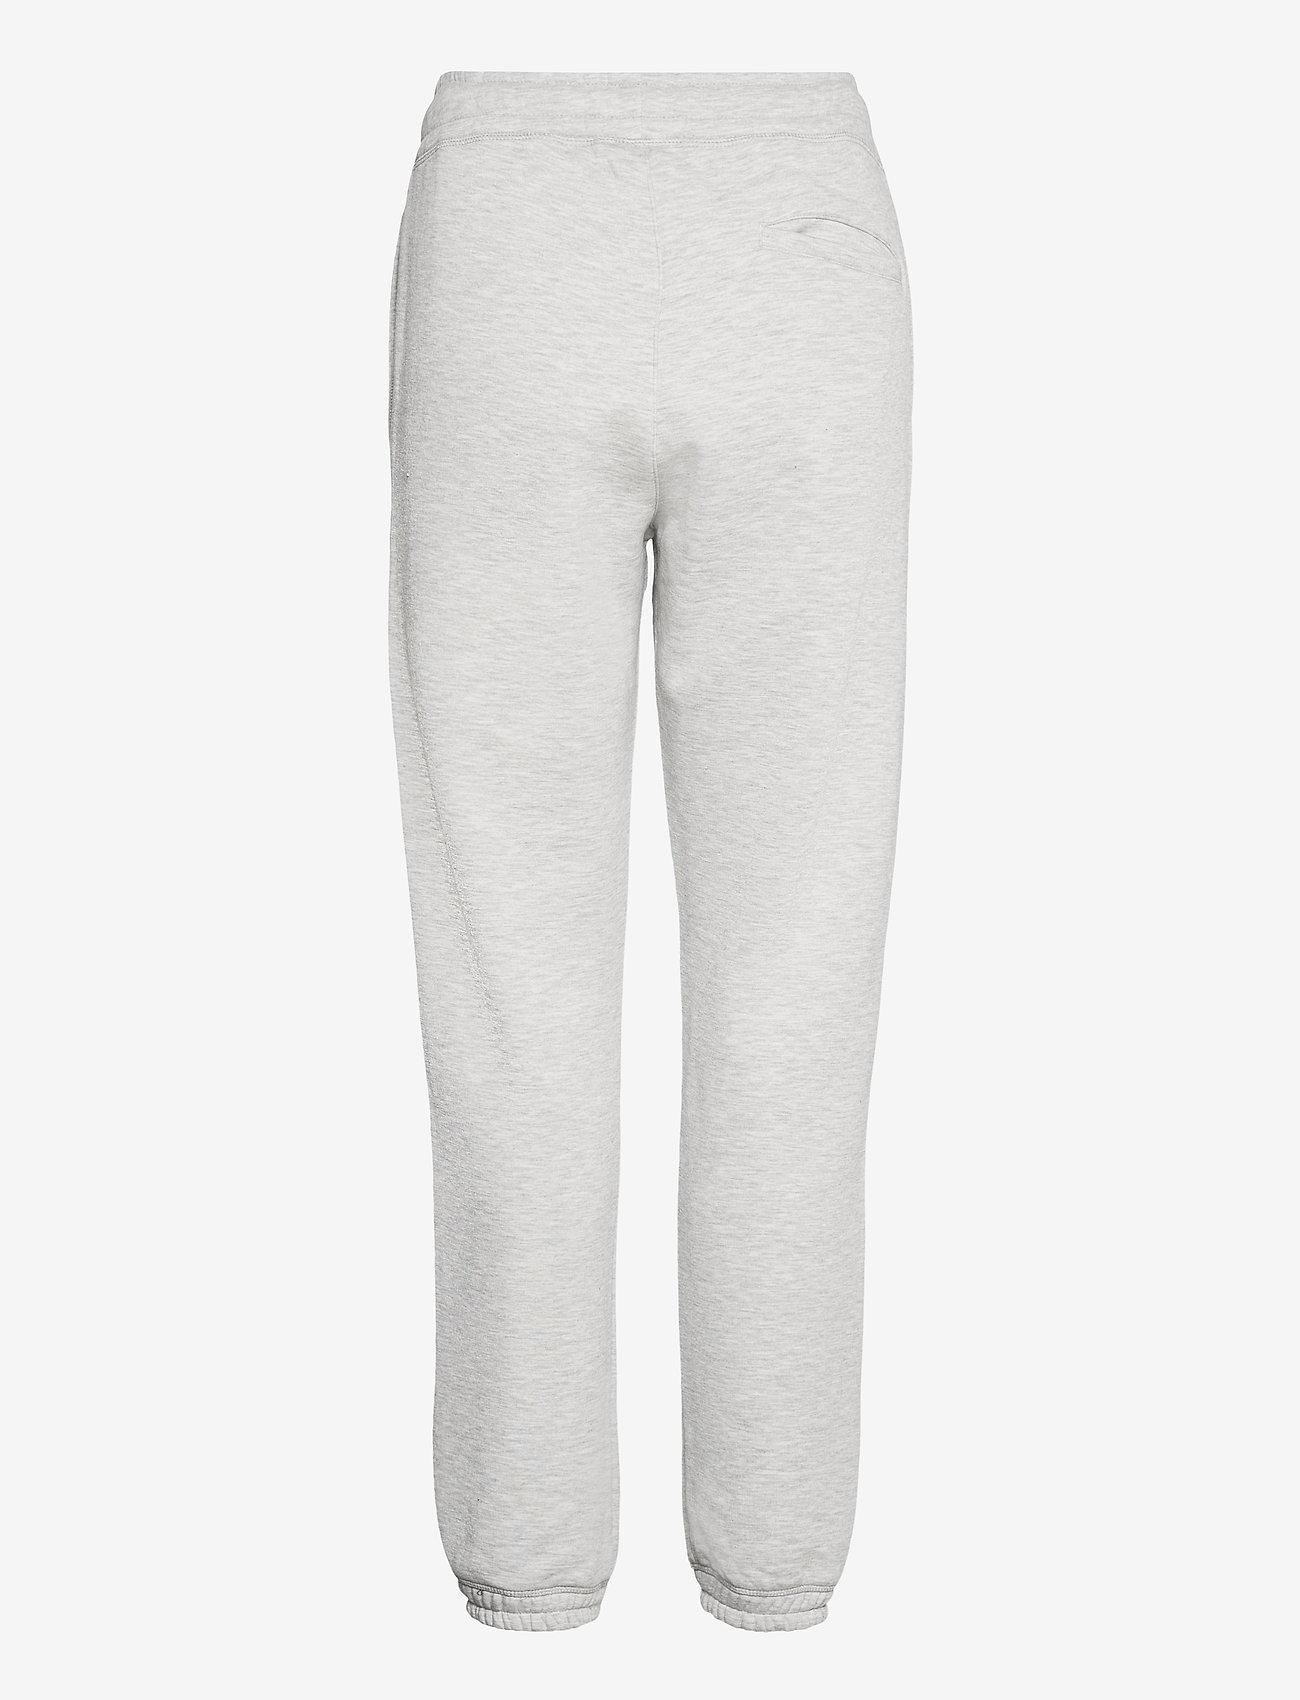 Soulland - Eisa pants - kleidung - grey melange - 1